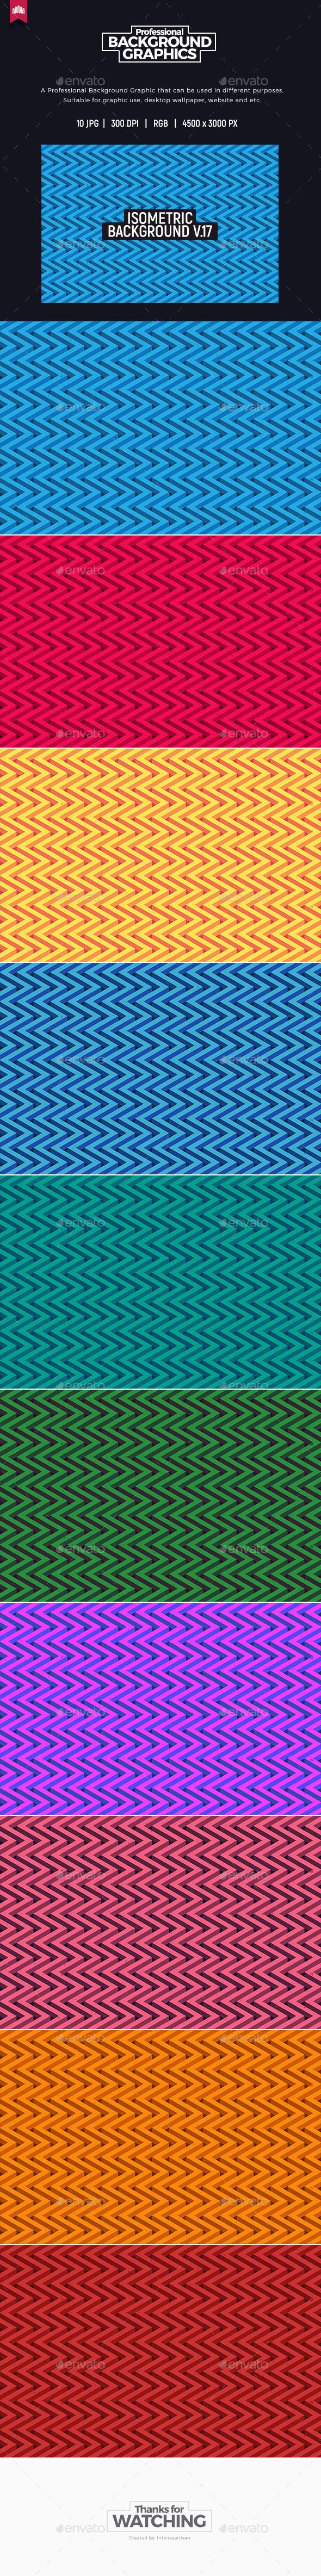 Isometric Background V.17 - Patterns Backgrounds